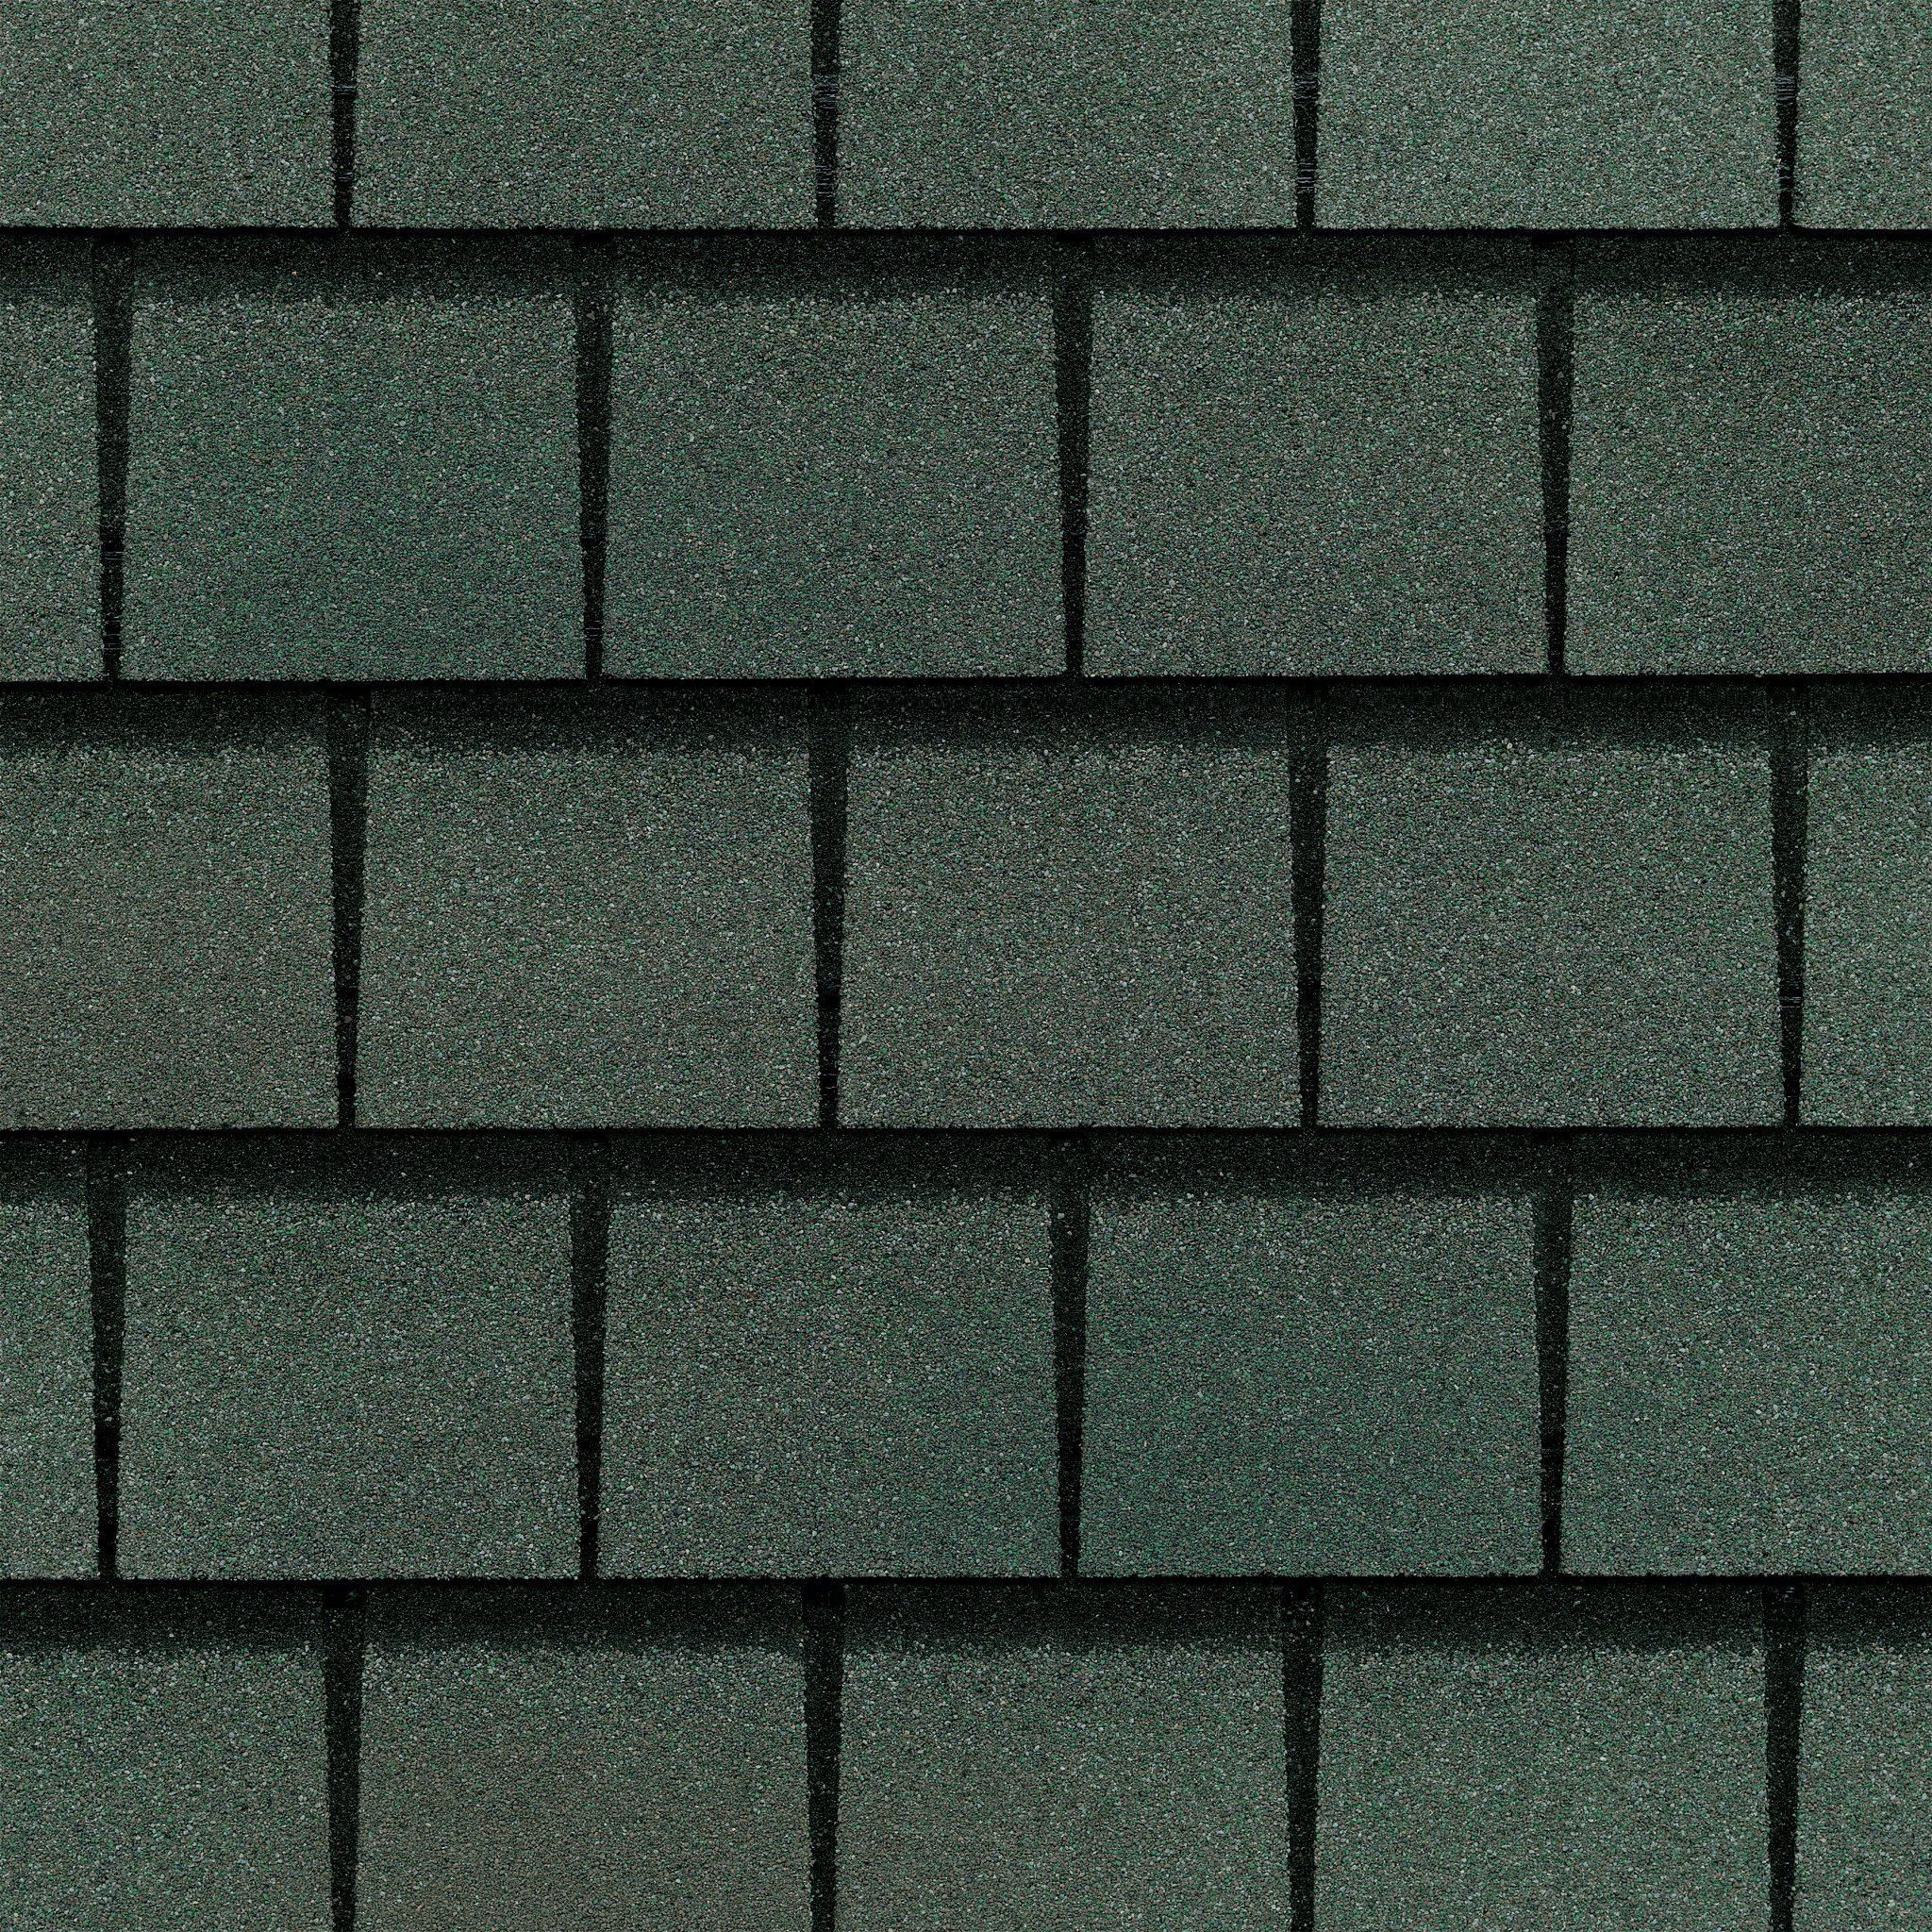 Close up photo of GAF's Slateline Emerald Green shingle swatch